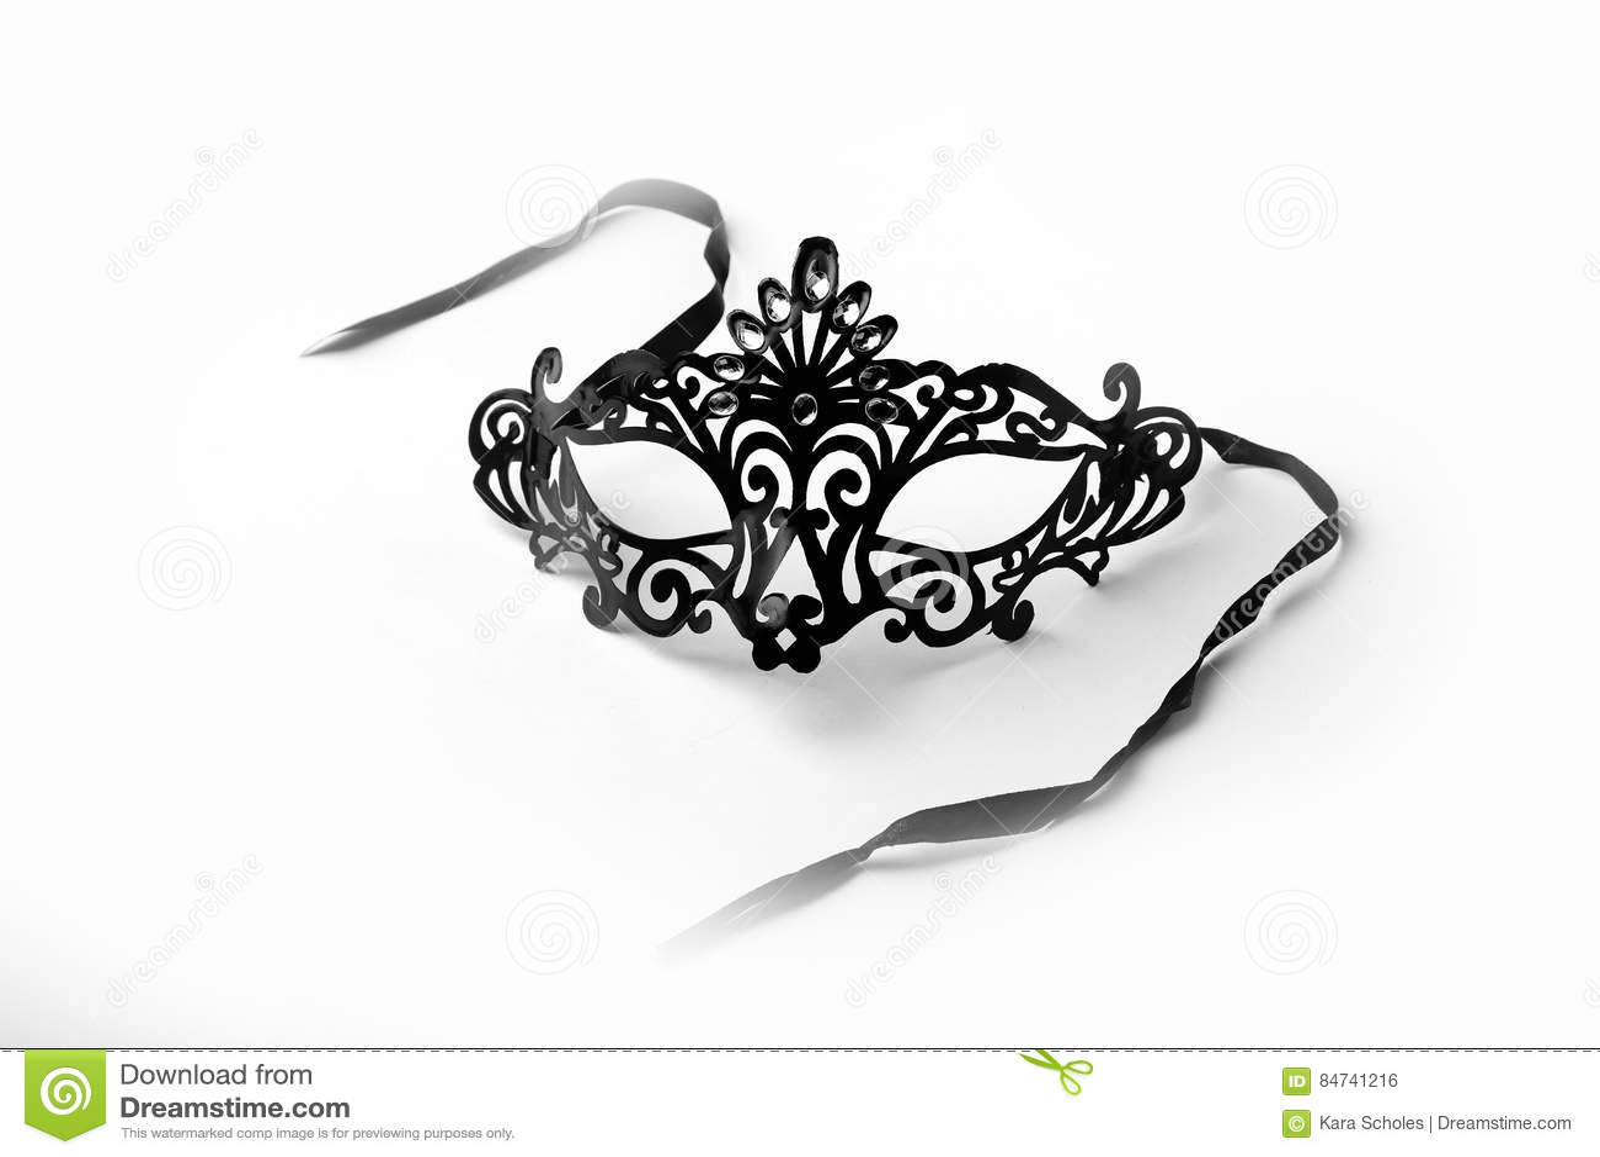 Black Ornate Masquerade Mask on White Background